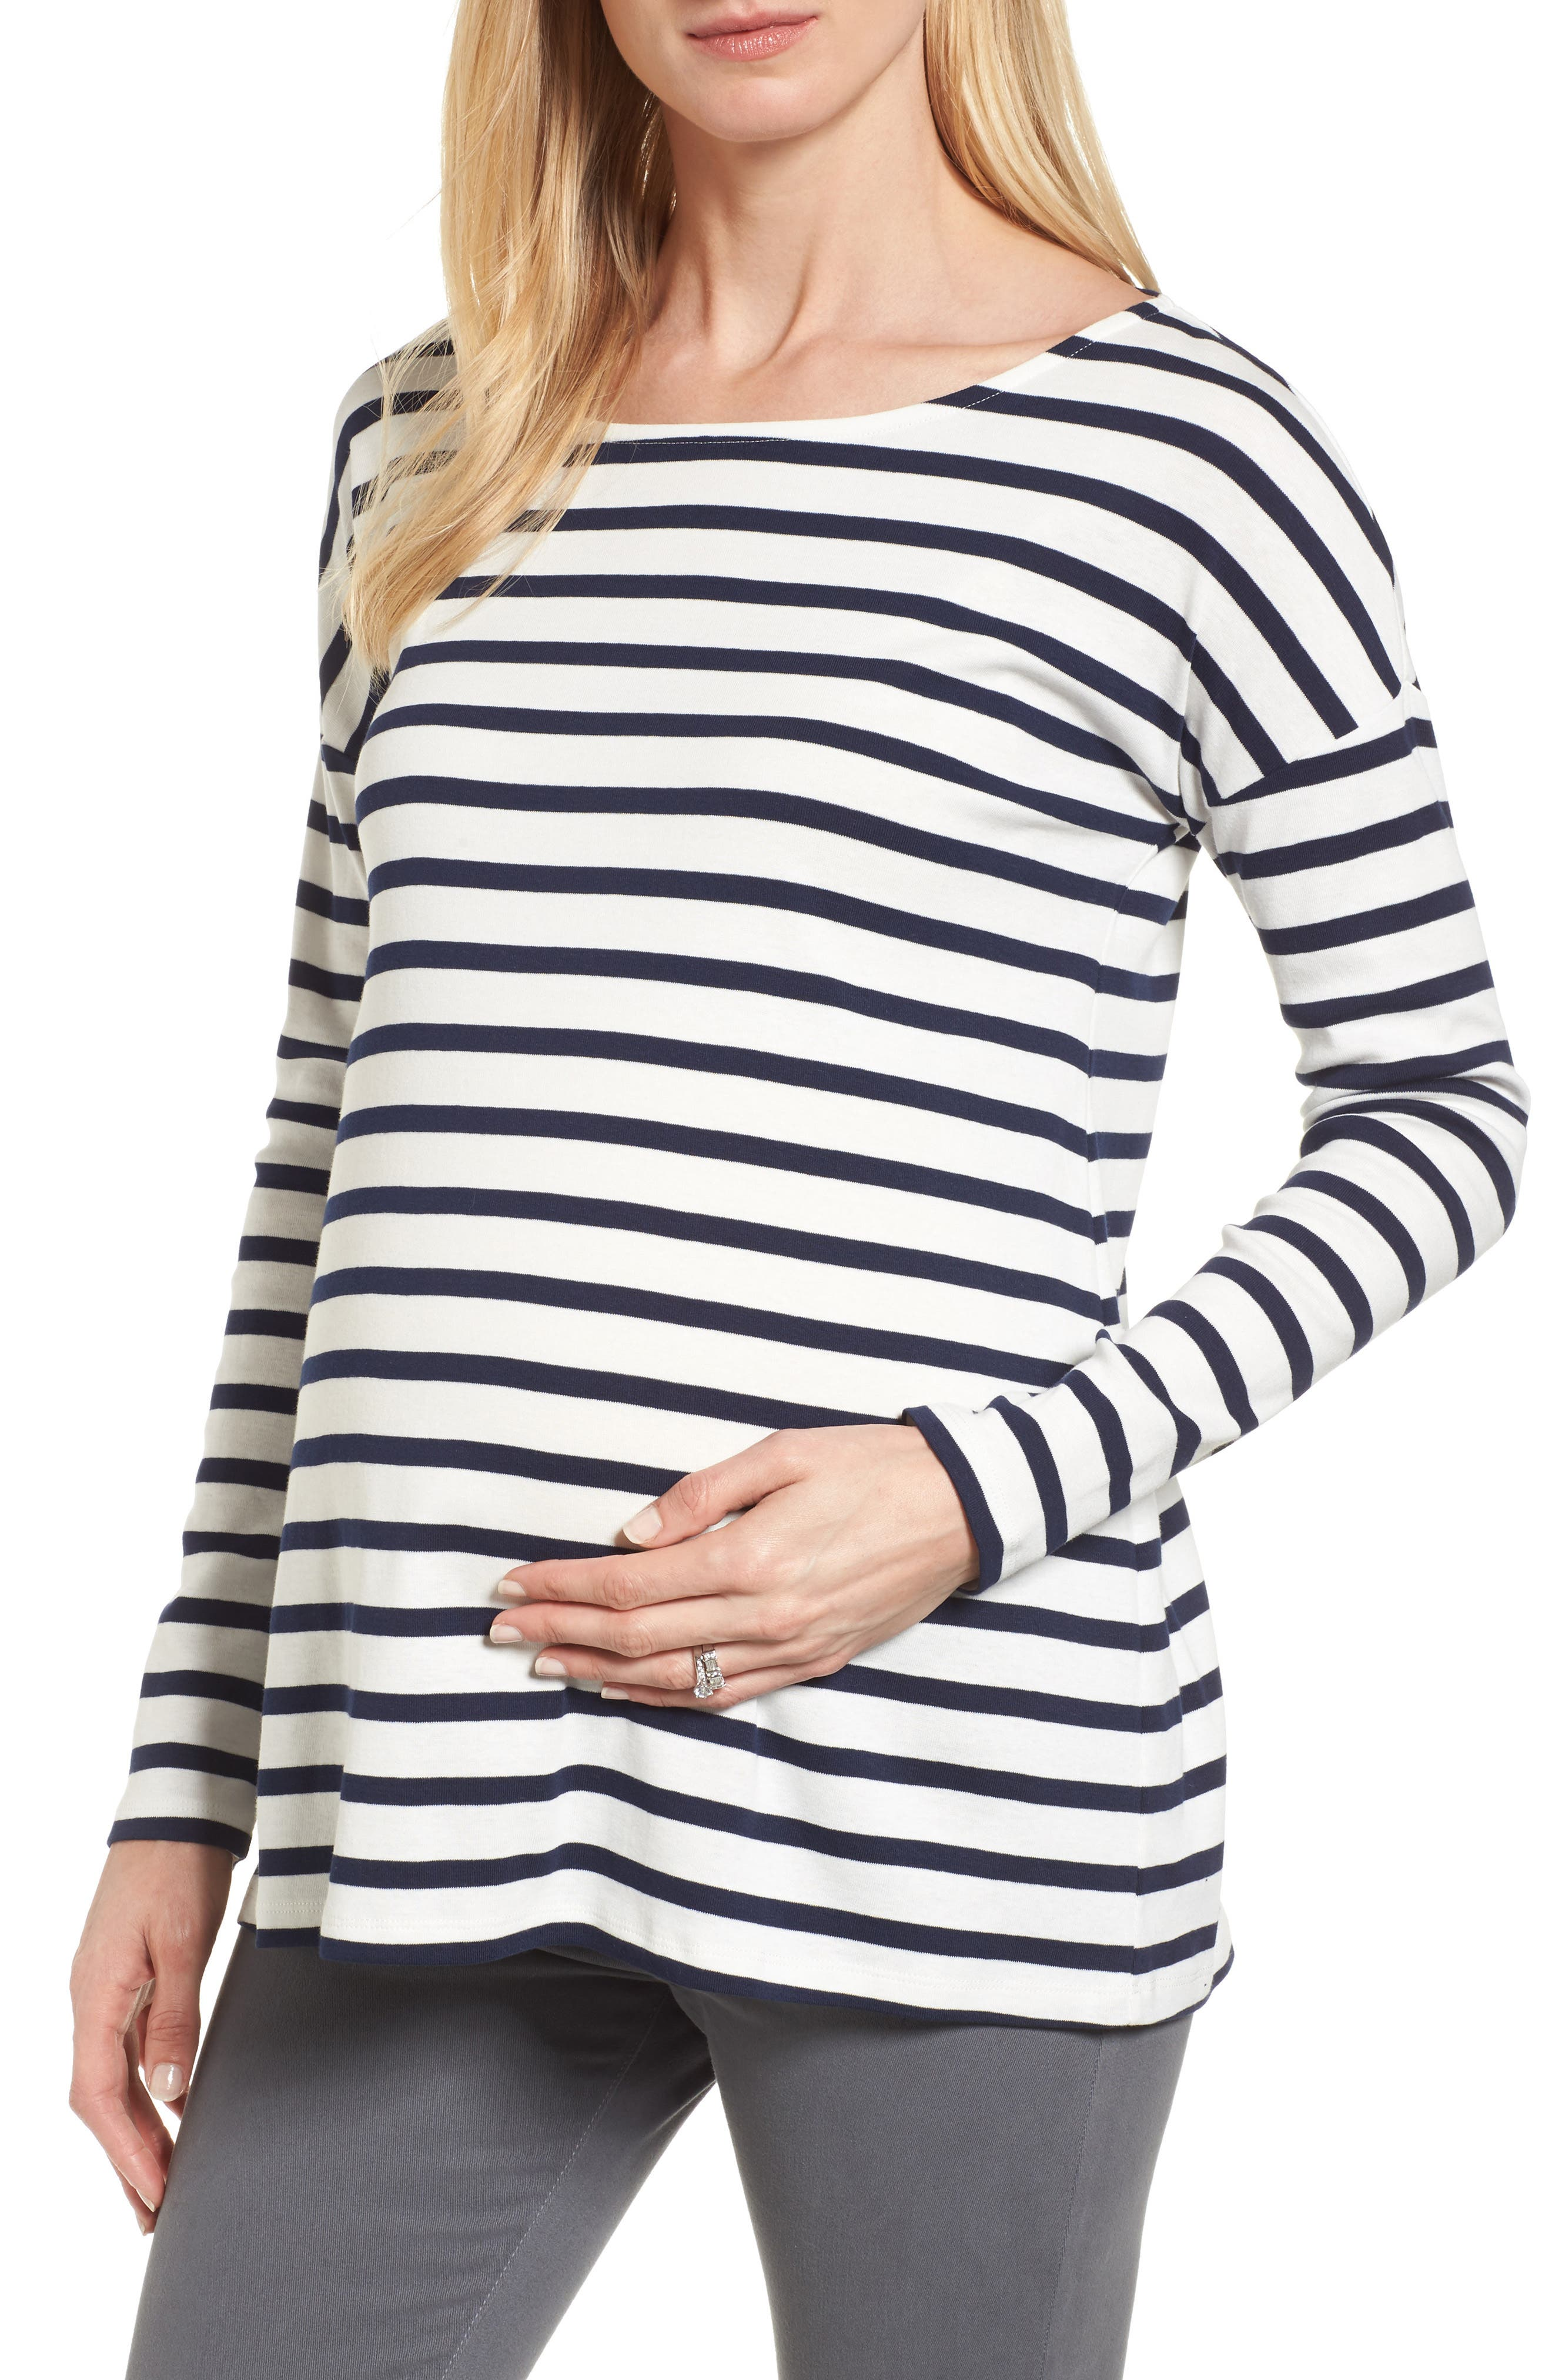 Caia Stripe Maternity Top,                             Main thumbnail 1, color,                             NAVY/ WHITE STRIPE